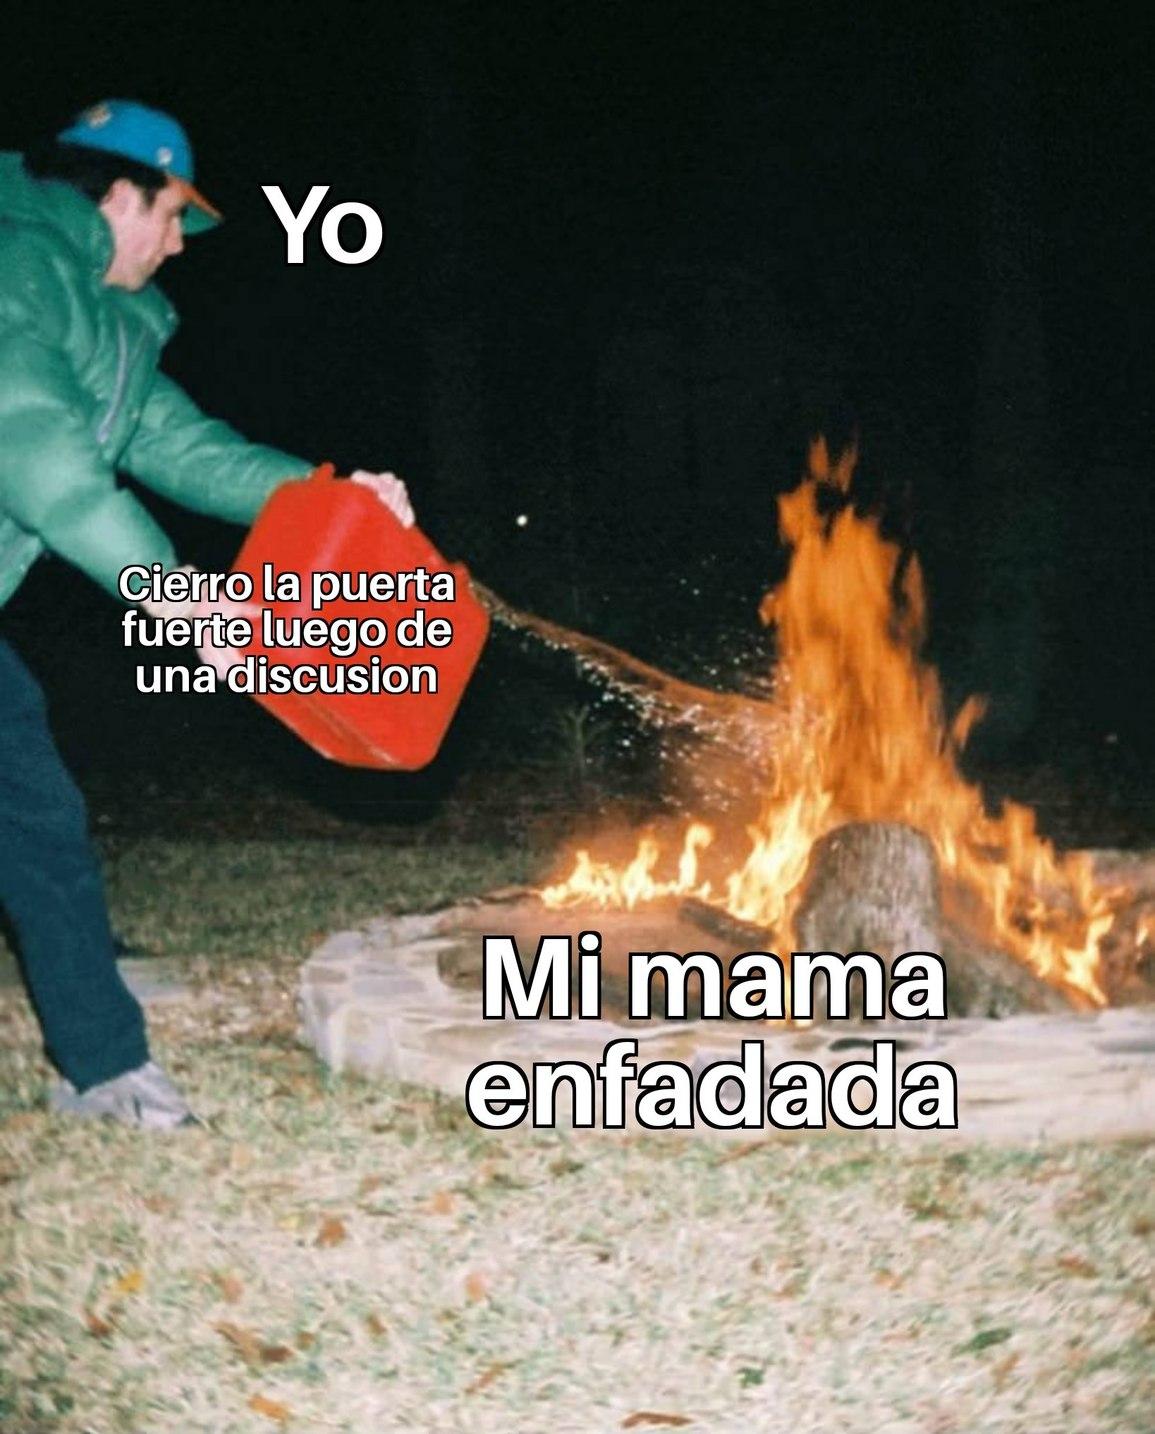 El liquido que tira al fuego es gasolina - meme